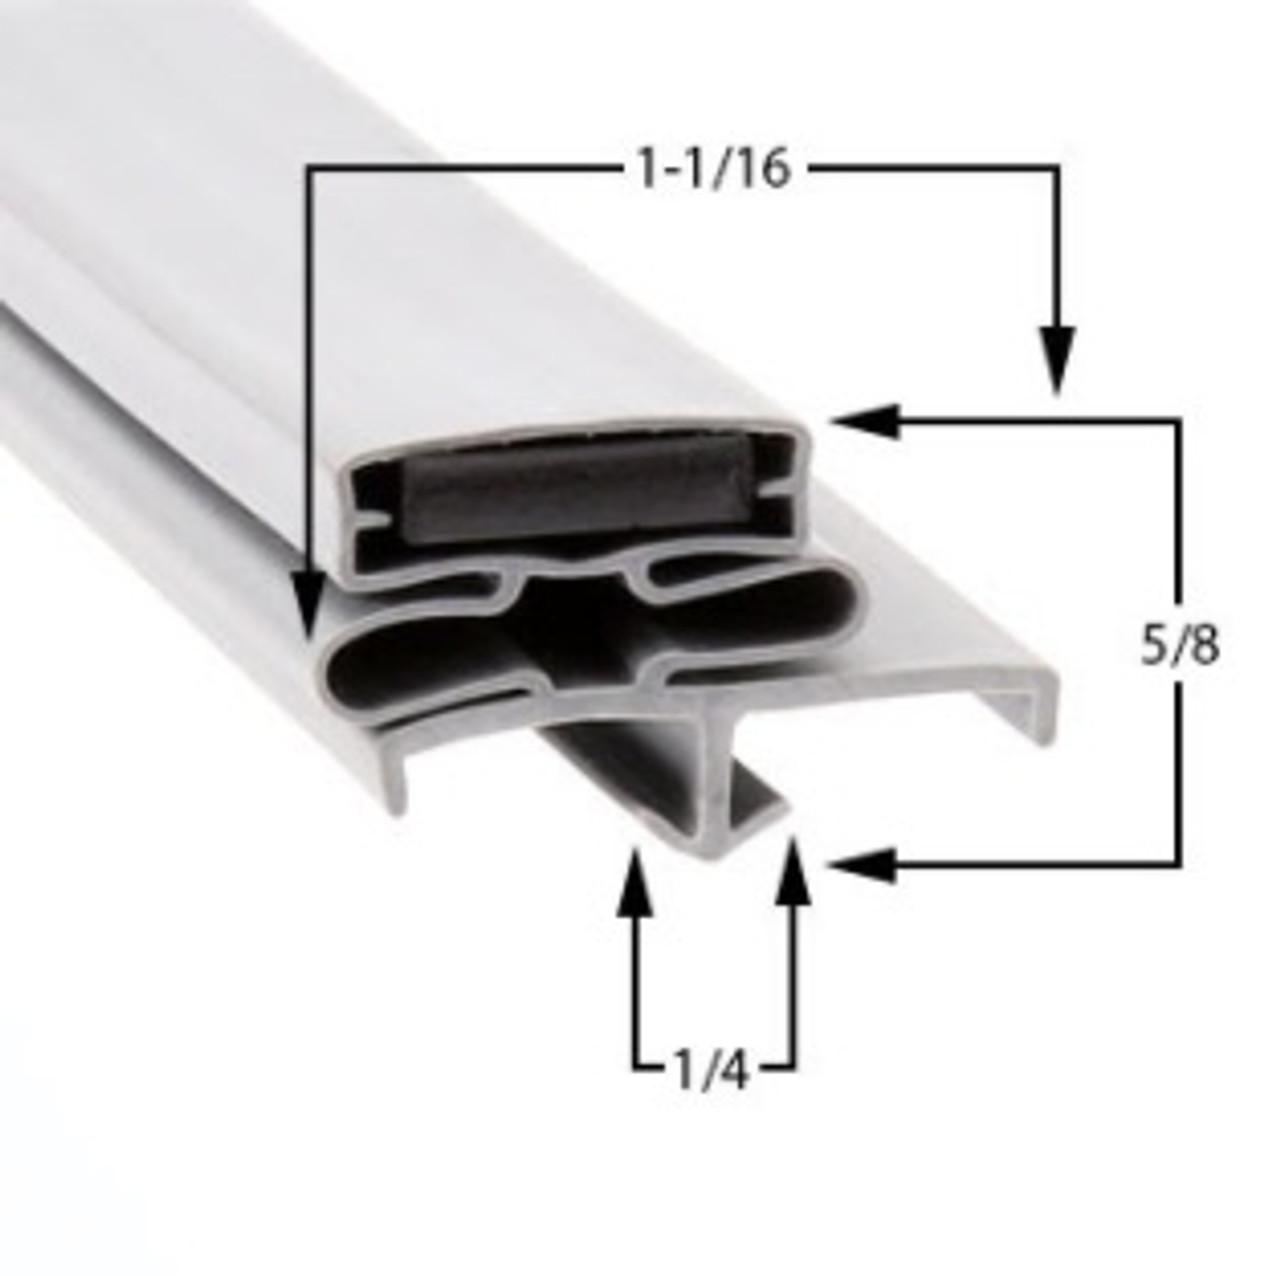 Federal Door Gasket Profile 168 26 3/4 x 62 -2